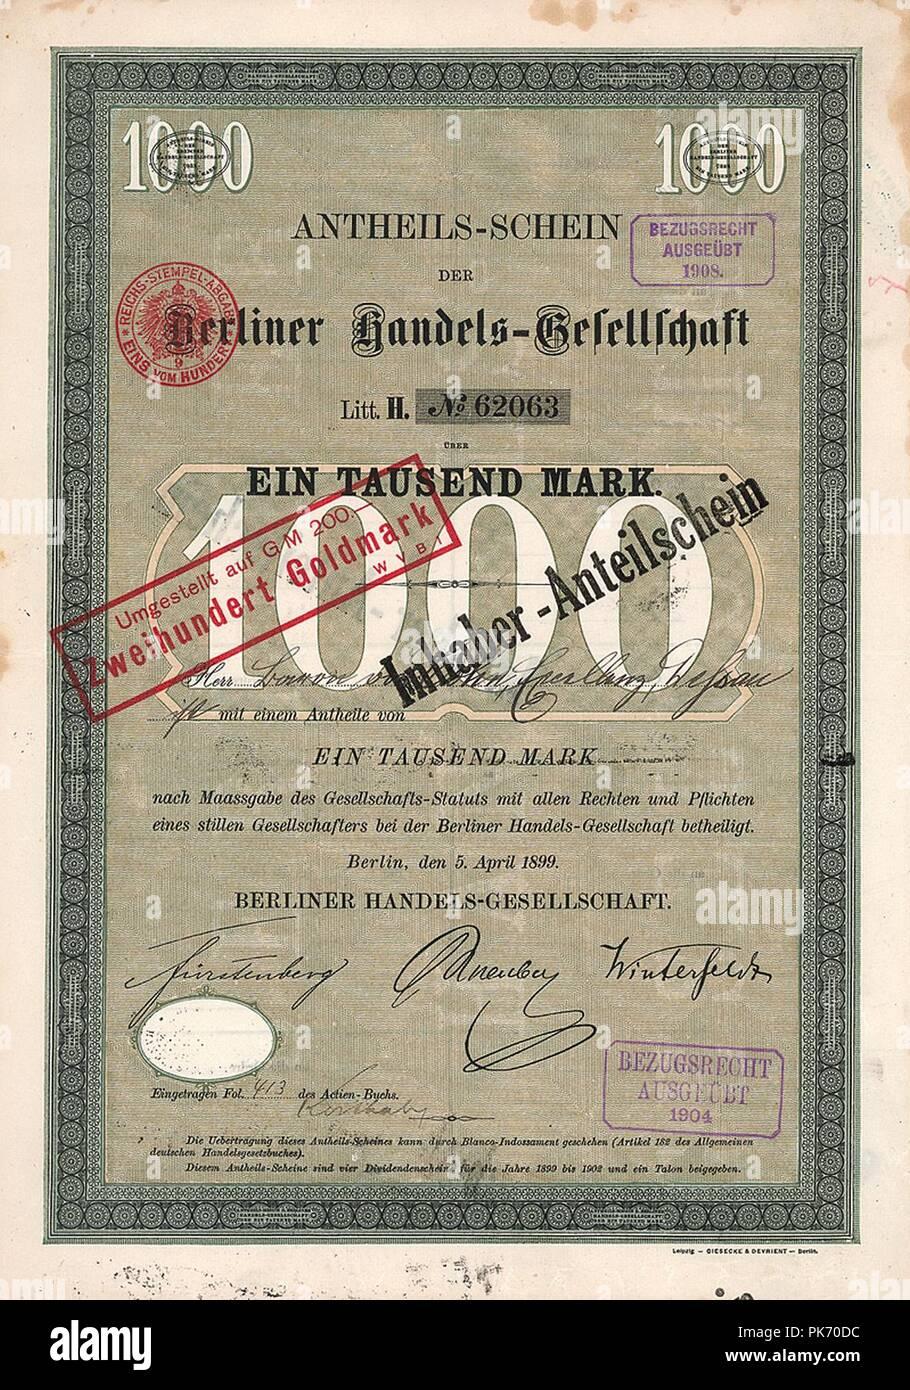 Berliner Handels-Gesellschaft 1899. - Stock Image